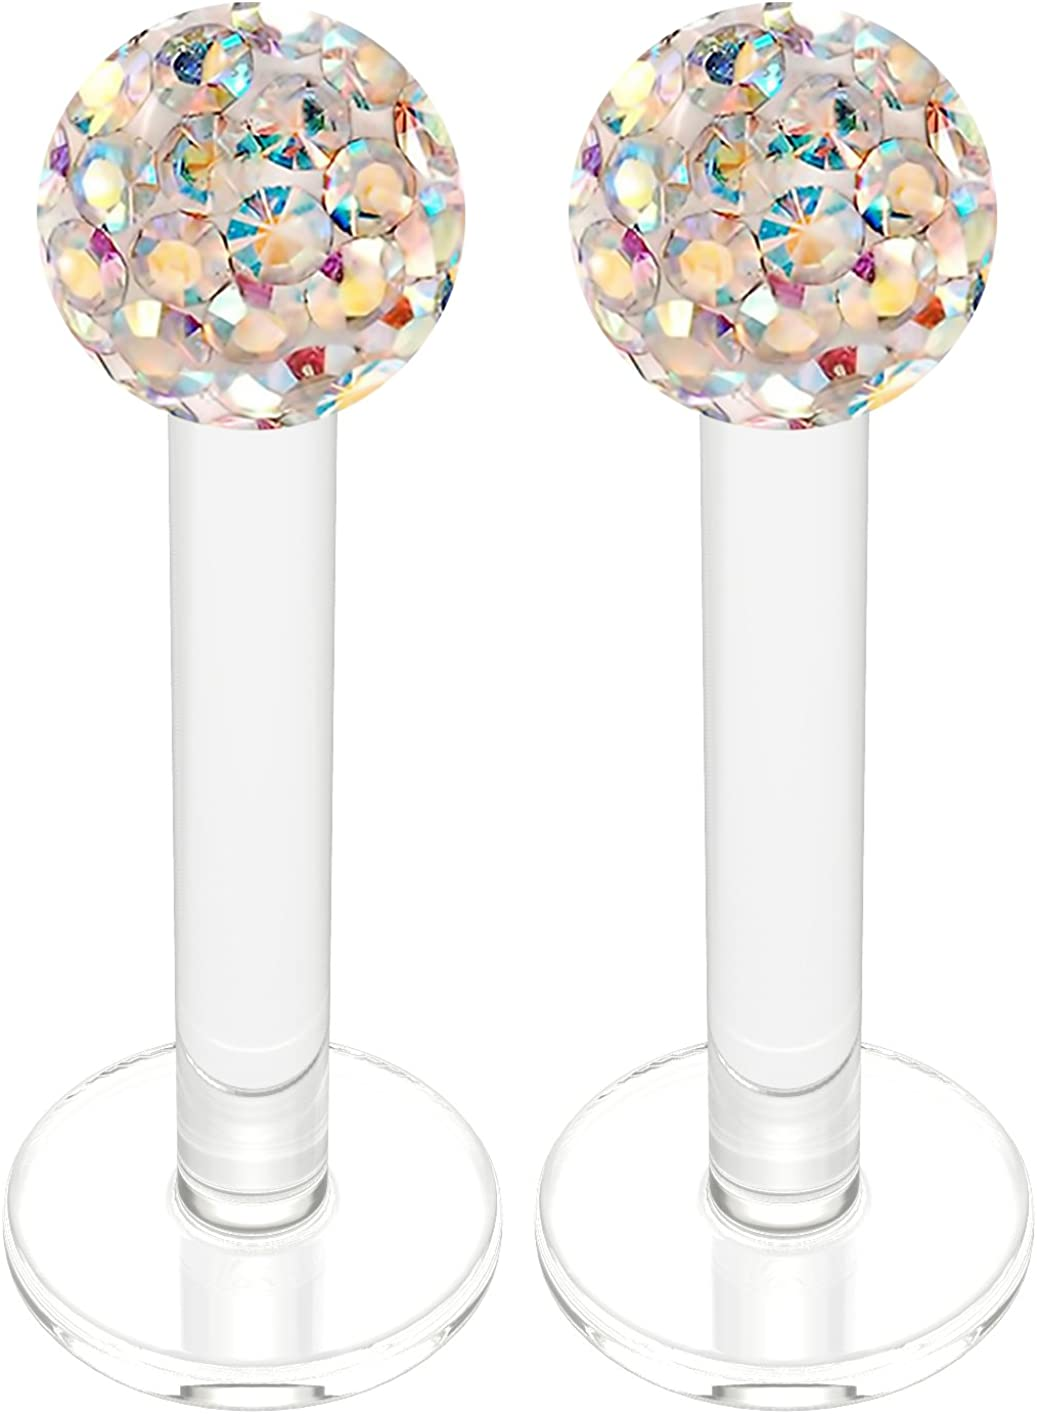 2pc Acrylic Lip Ring Studs 16 Gauge 5/16 8mm Marilyn Monroe Piercing Jewelry 3mm Crystal Ball